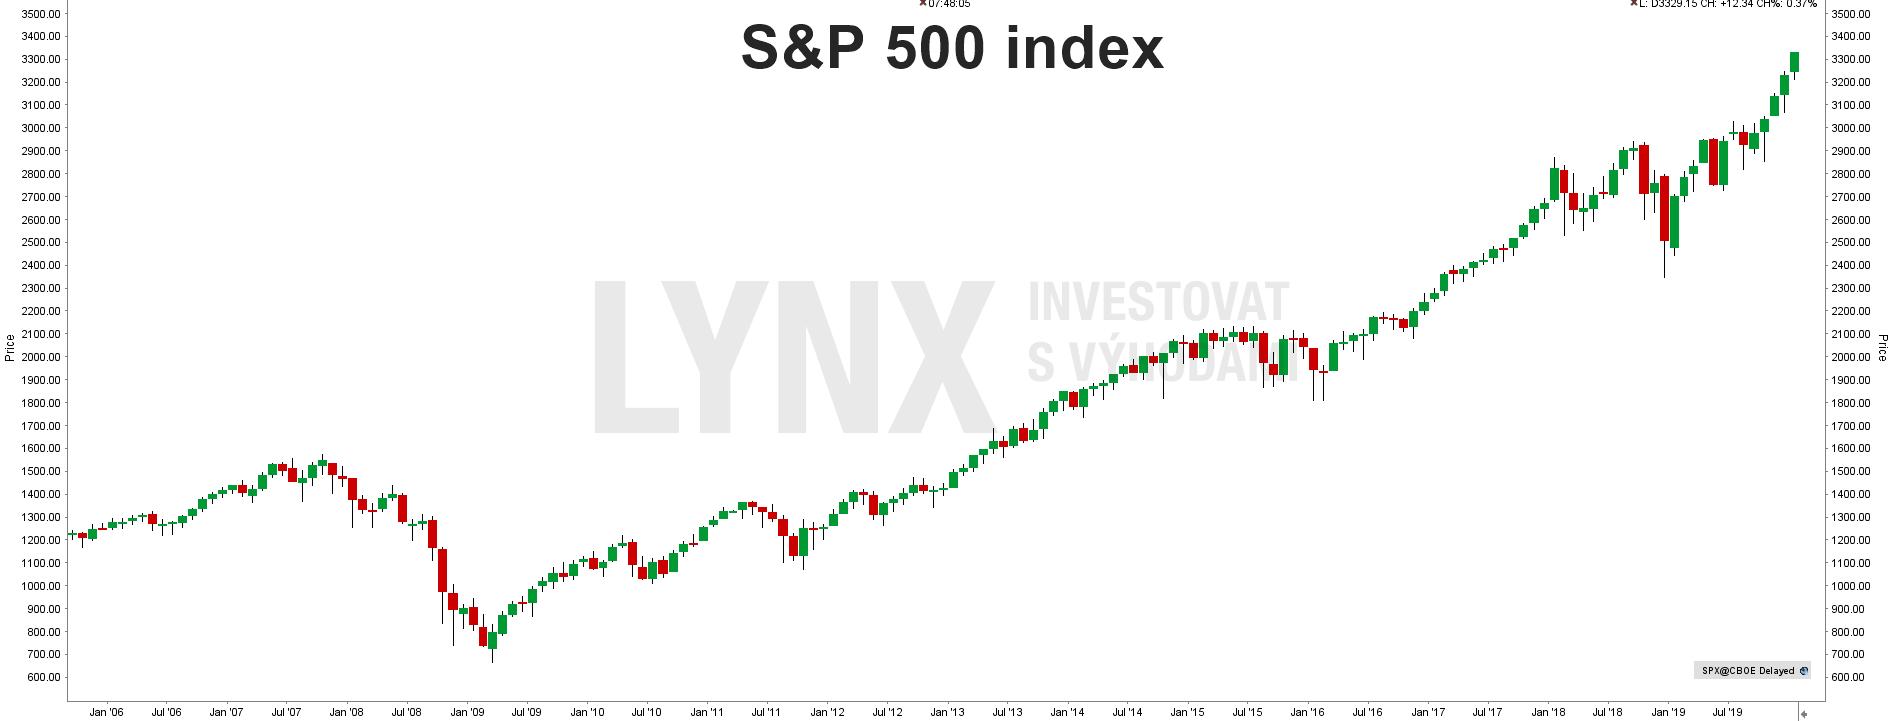 S&P 500 indexu - historický graf